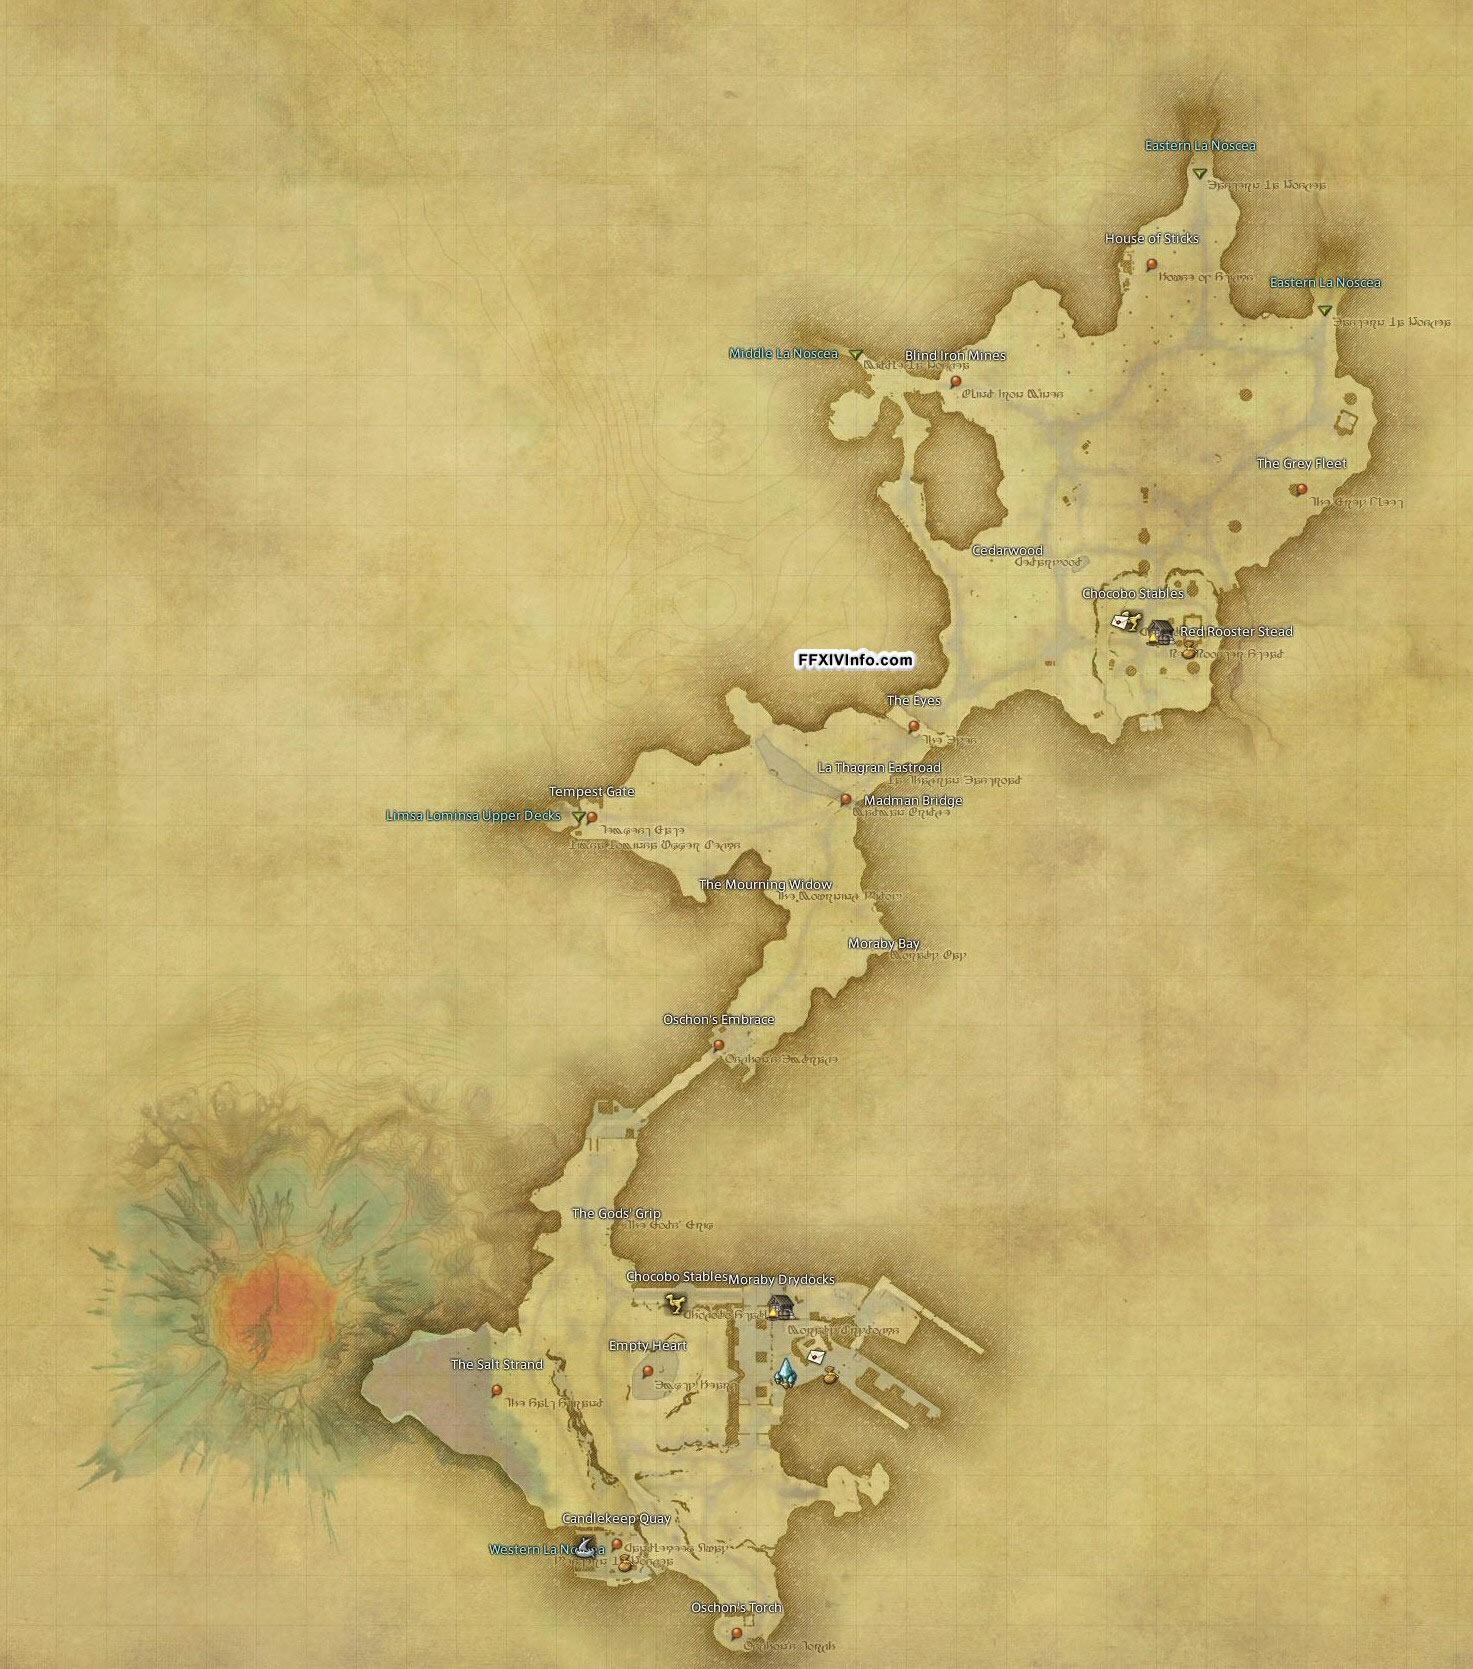 Lower La Noscea - Maps | FFXIV: A Realm Reborn Info (FF14)